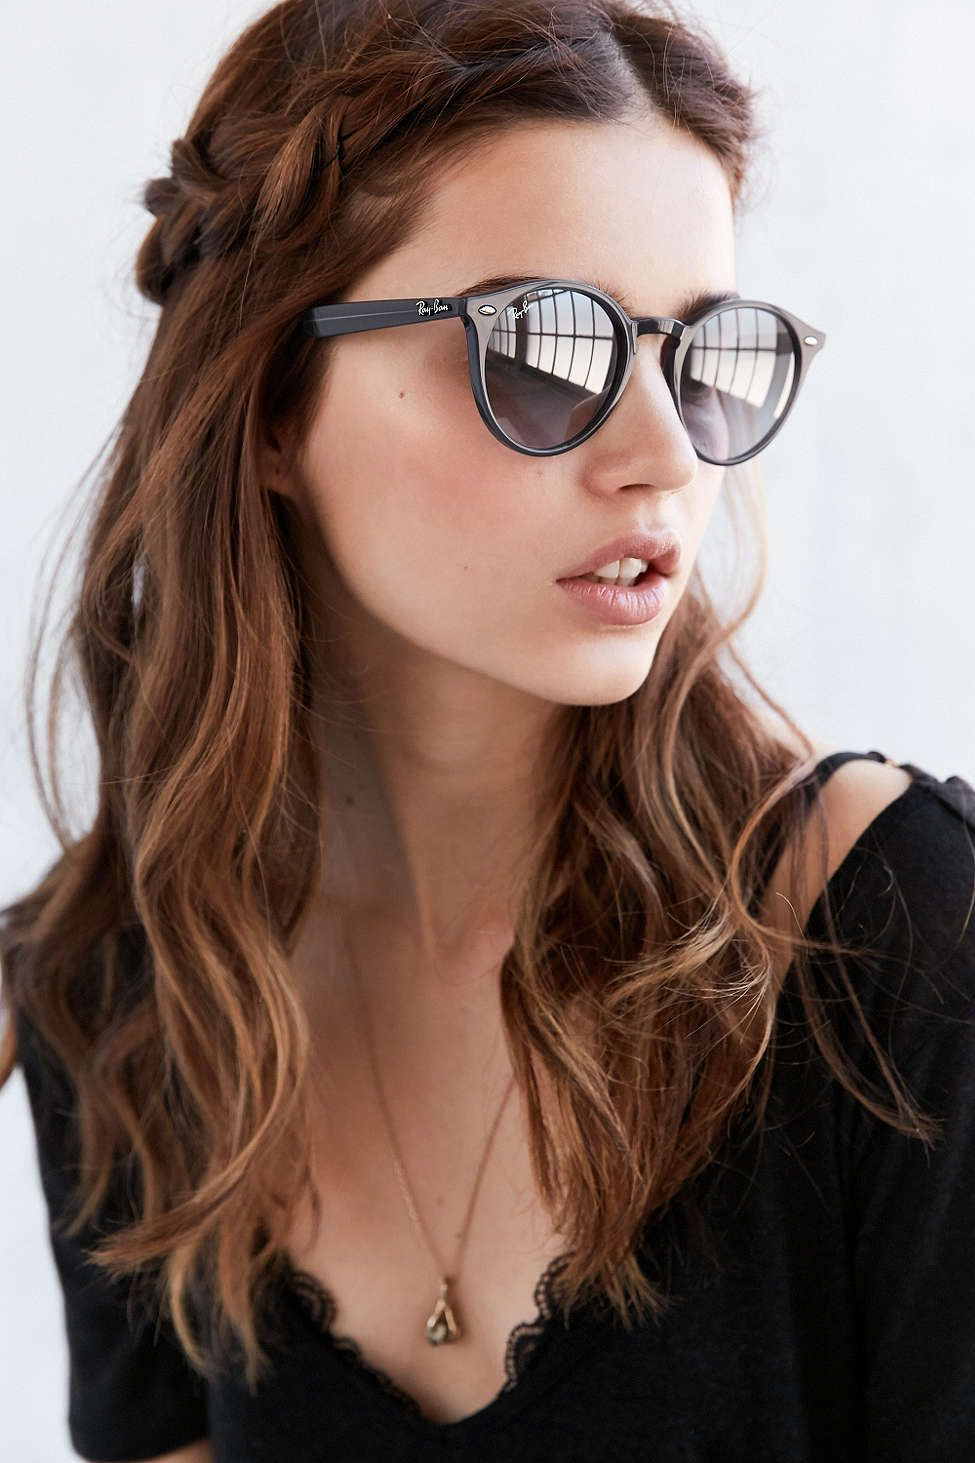 c62ae8ebca19 Ray-Ban Highstreet Round Sunglasses | Clothing | Sunglasses, Ray ...